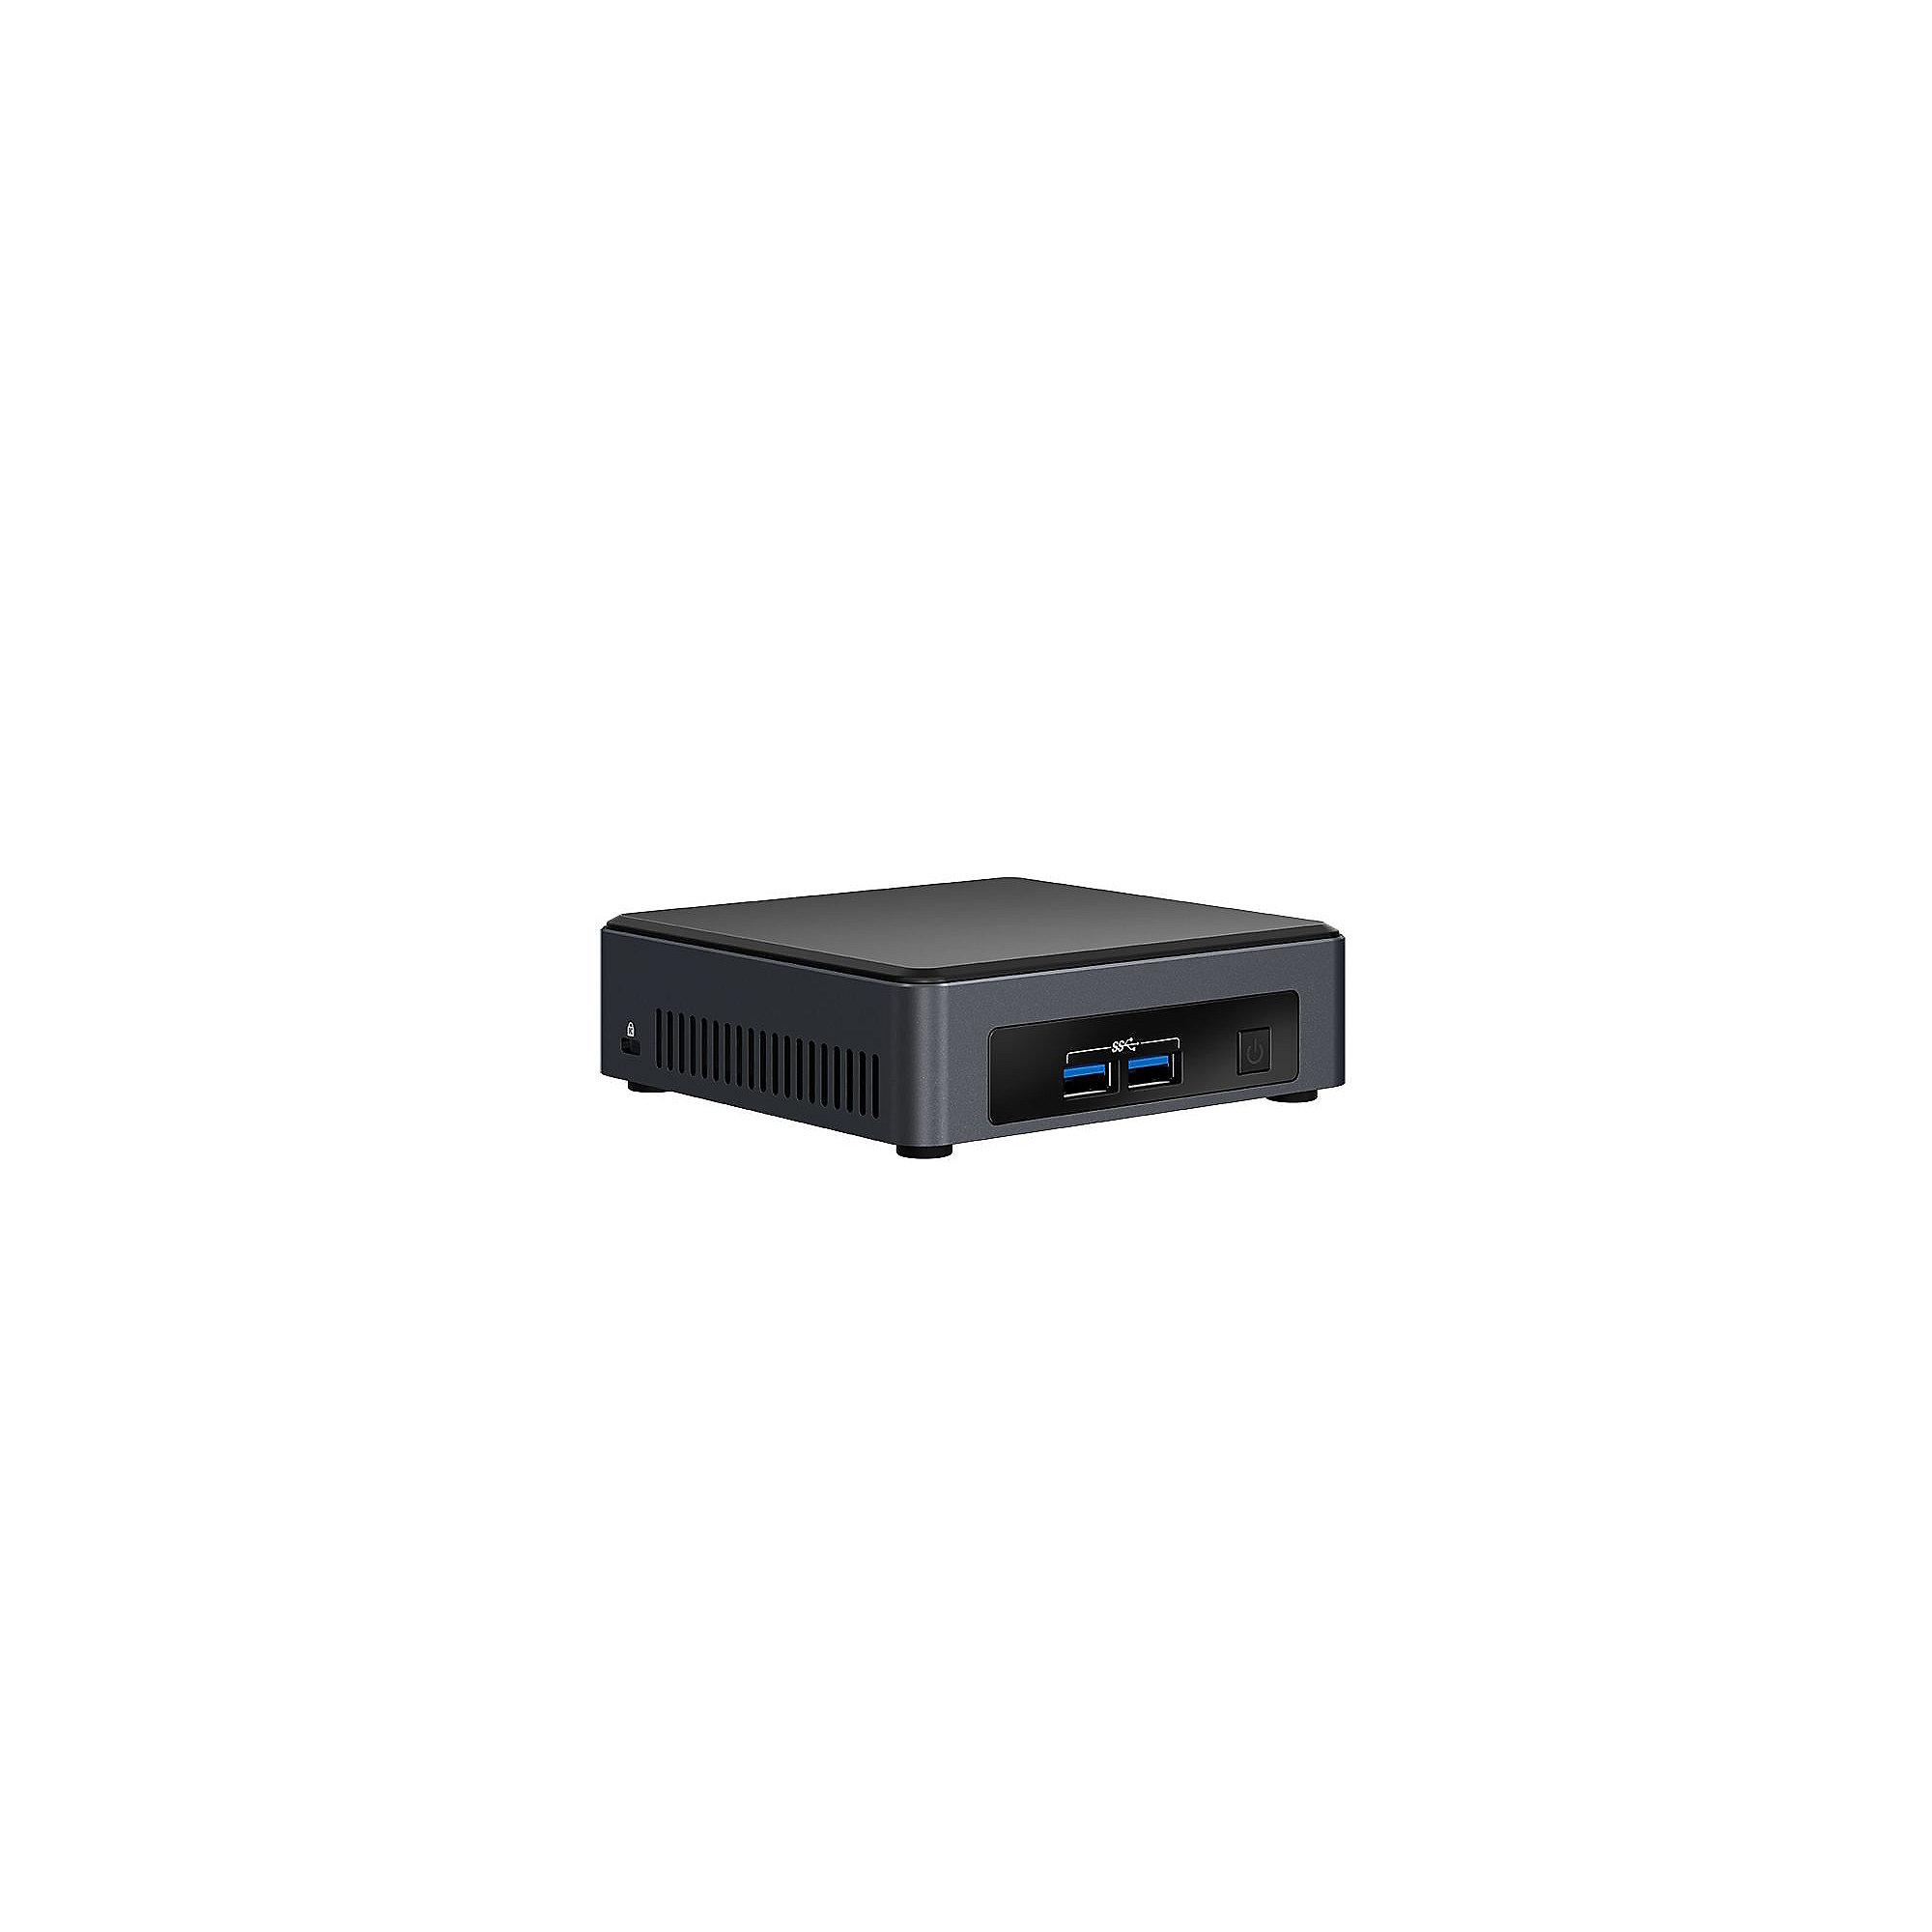 CP1126-05T Intel NUC BLKNUC7i5DNK2E i5-7300 0GB/0GB ohne Windows